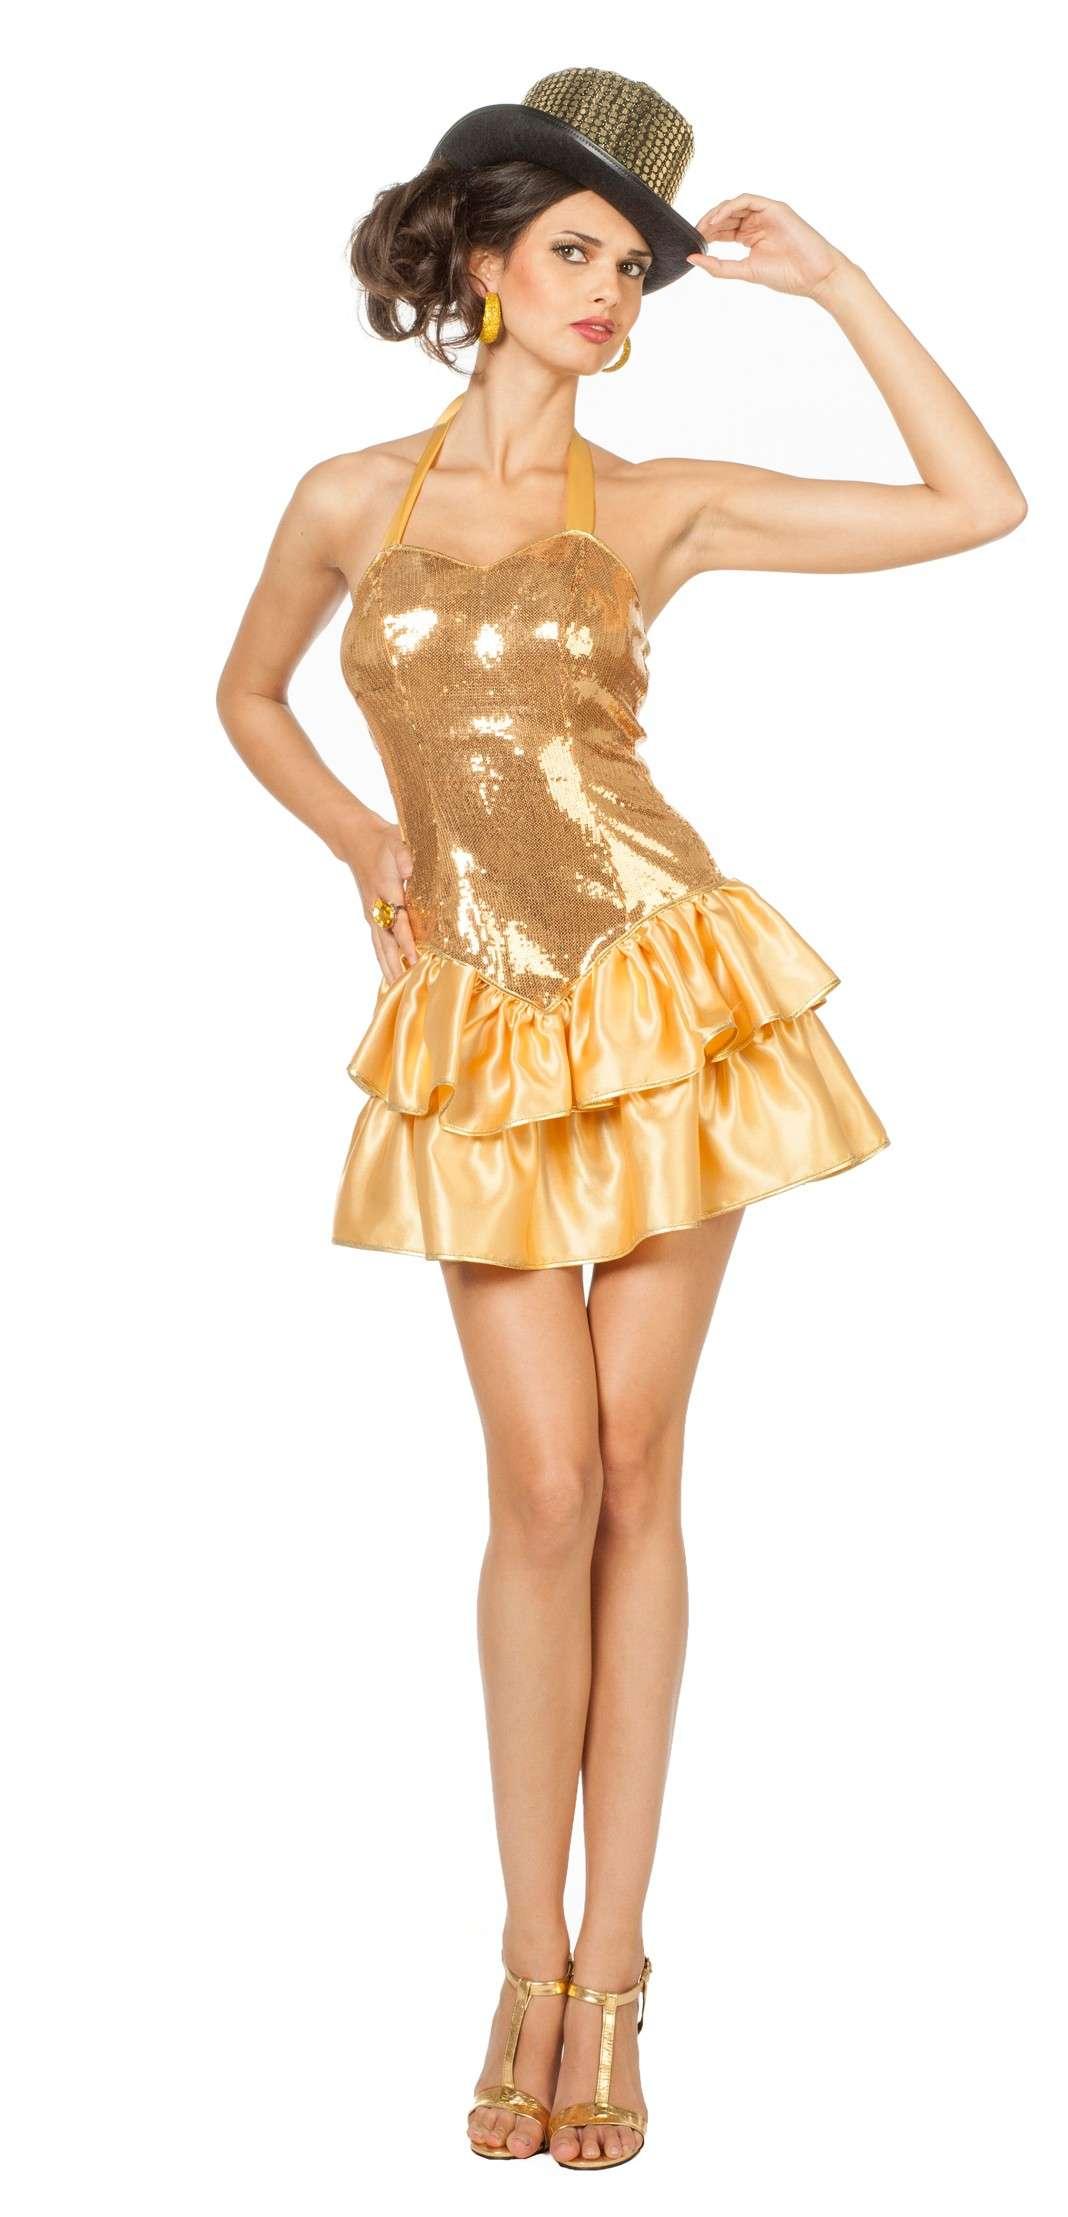 glamour showgirl tanja damenkostuem gold 16Gwb2nglMyUfZ 1280x1280 2x